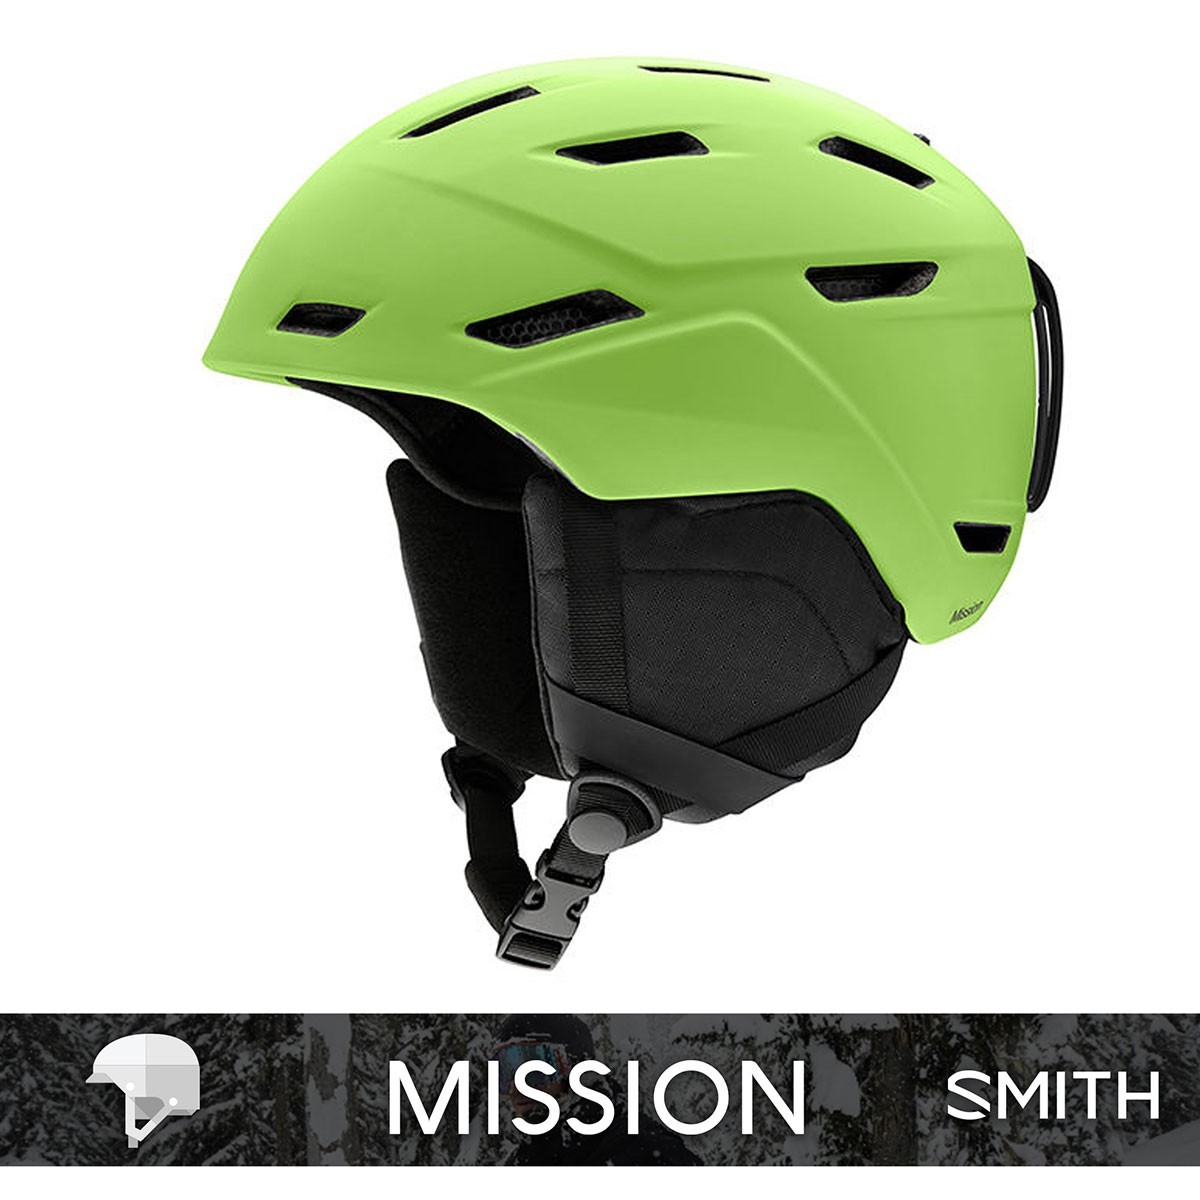 SMITH MISSION matte Flash - Изображение - AQUAMATRIX